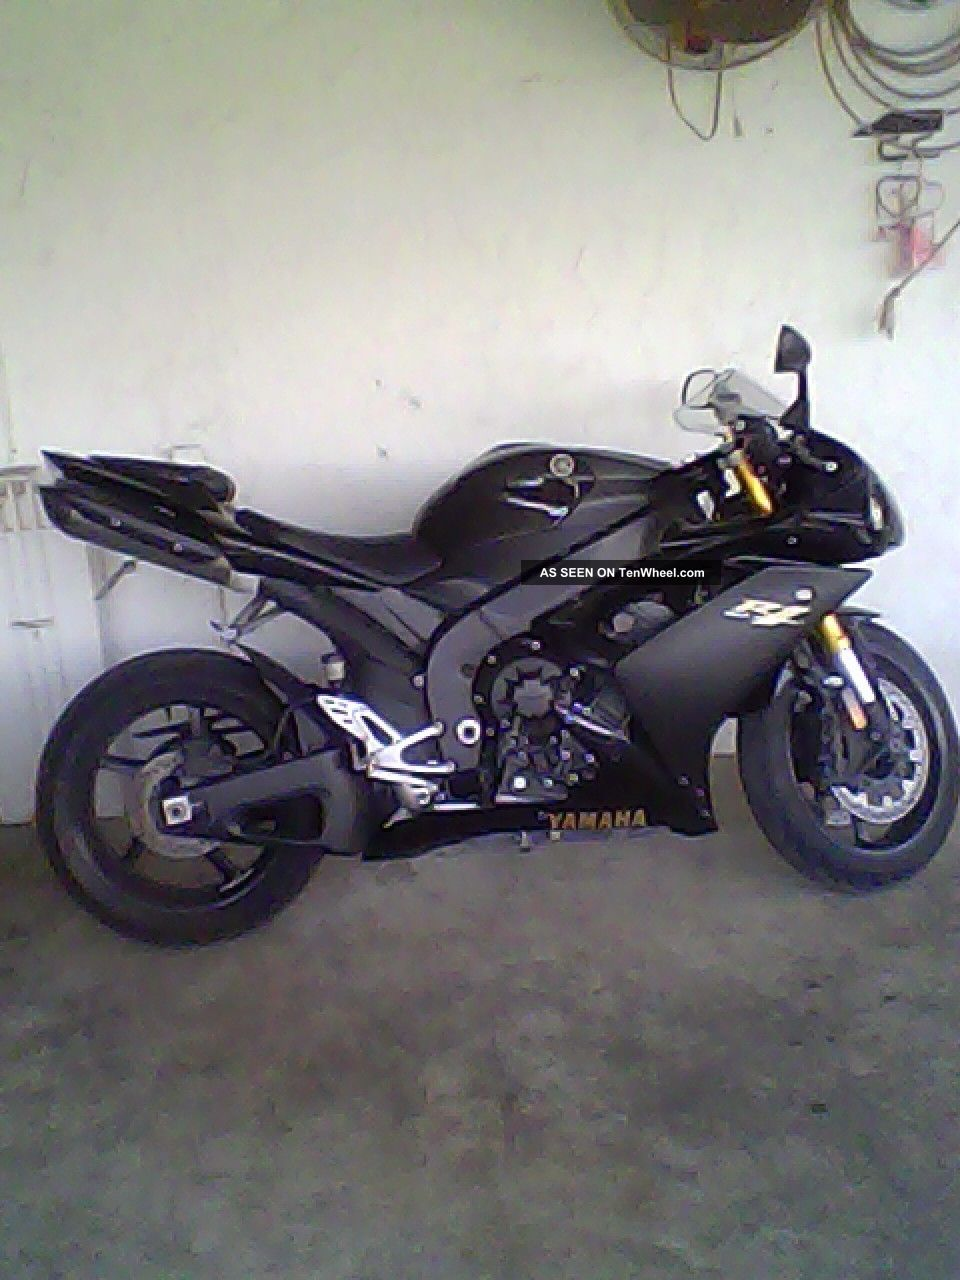 Yamaha R1 2008 YZF-R photo